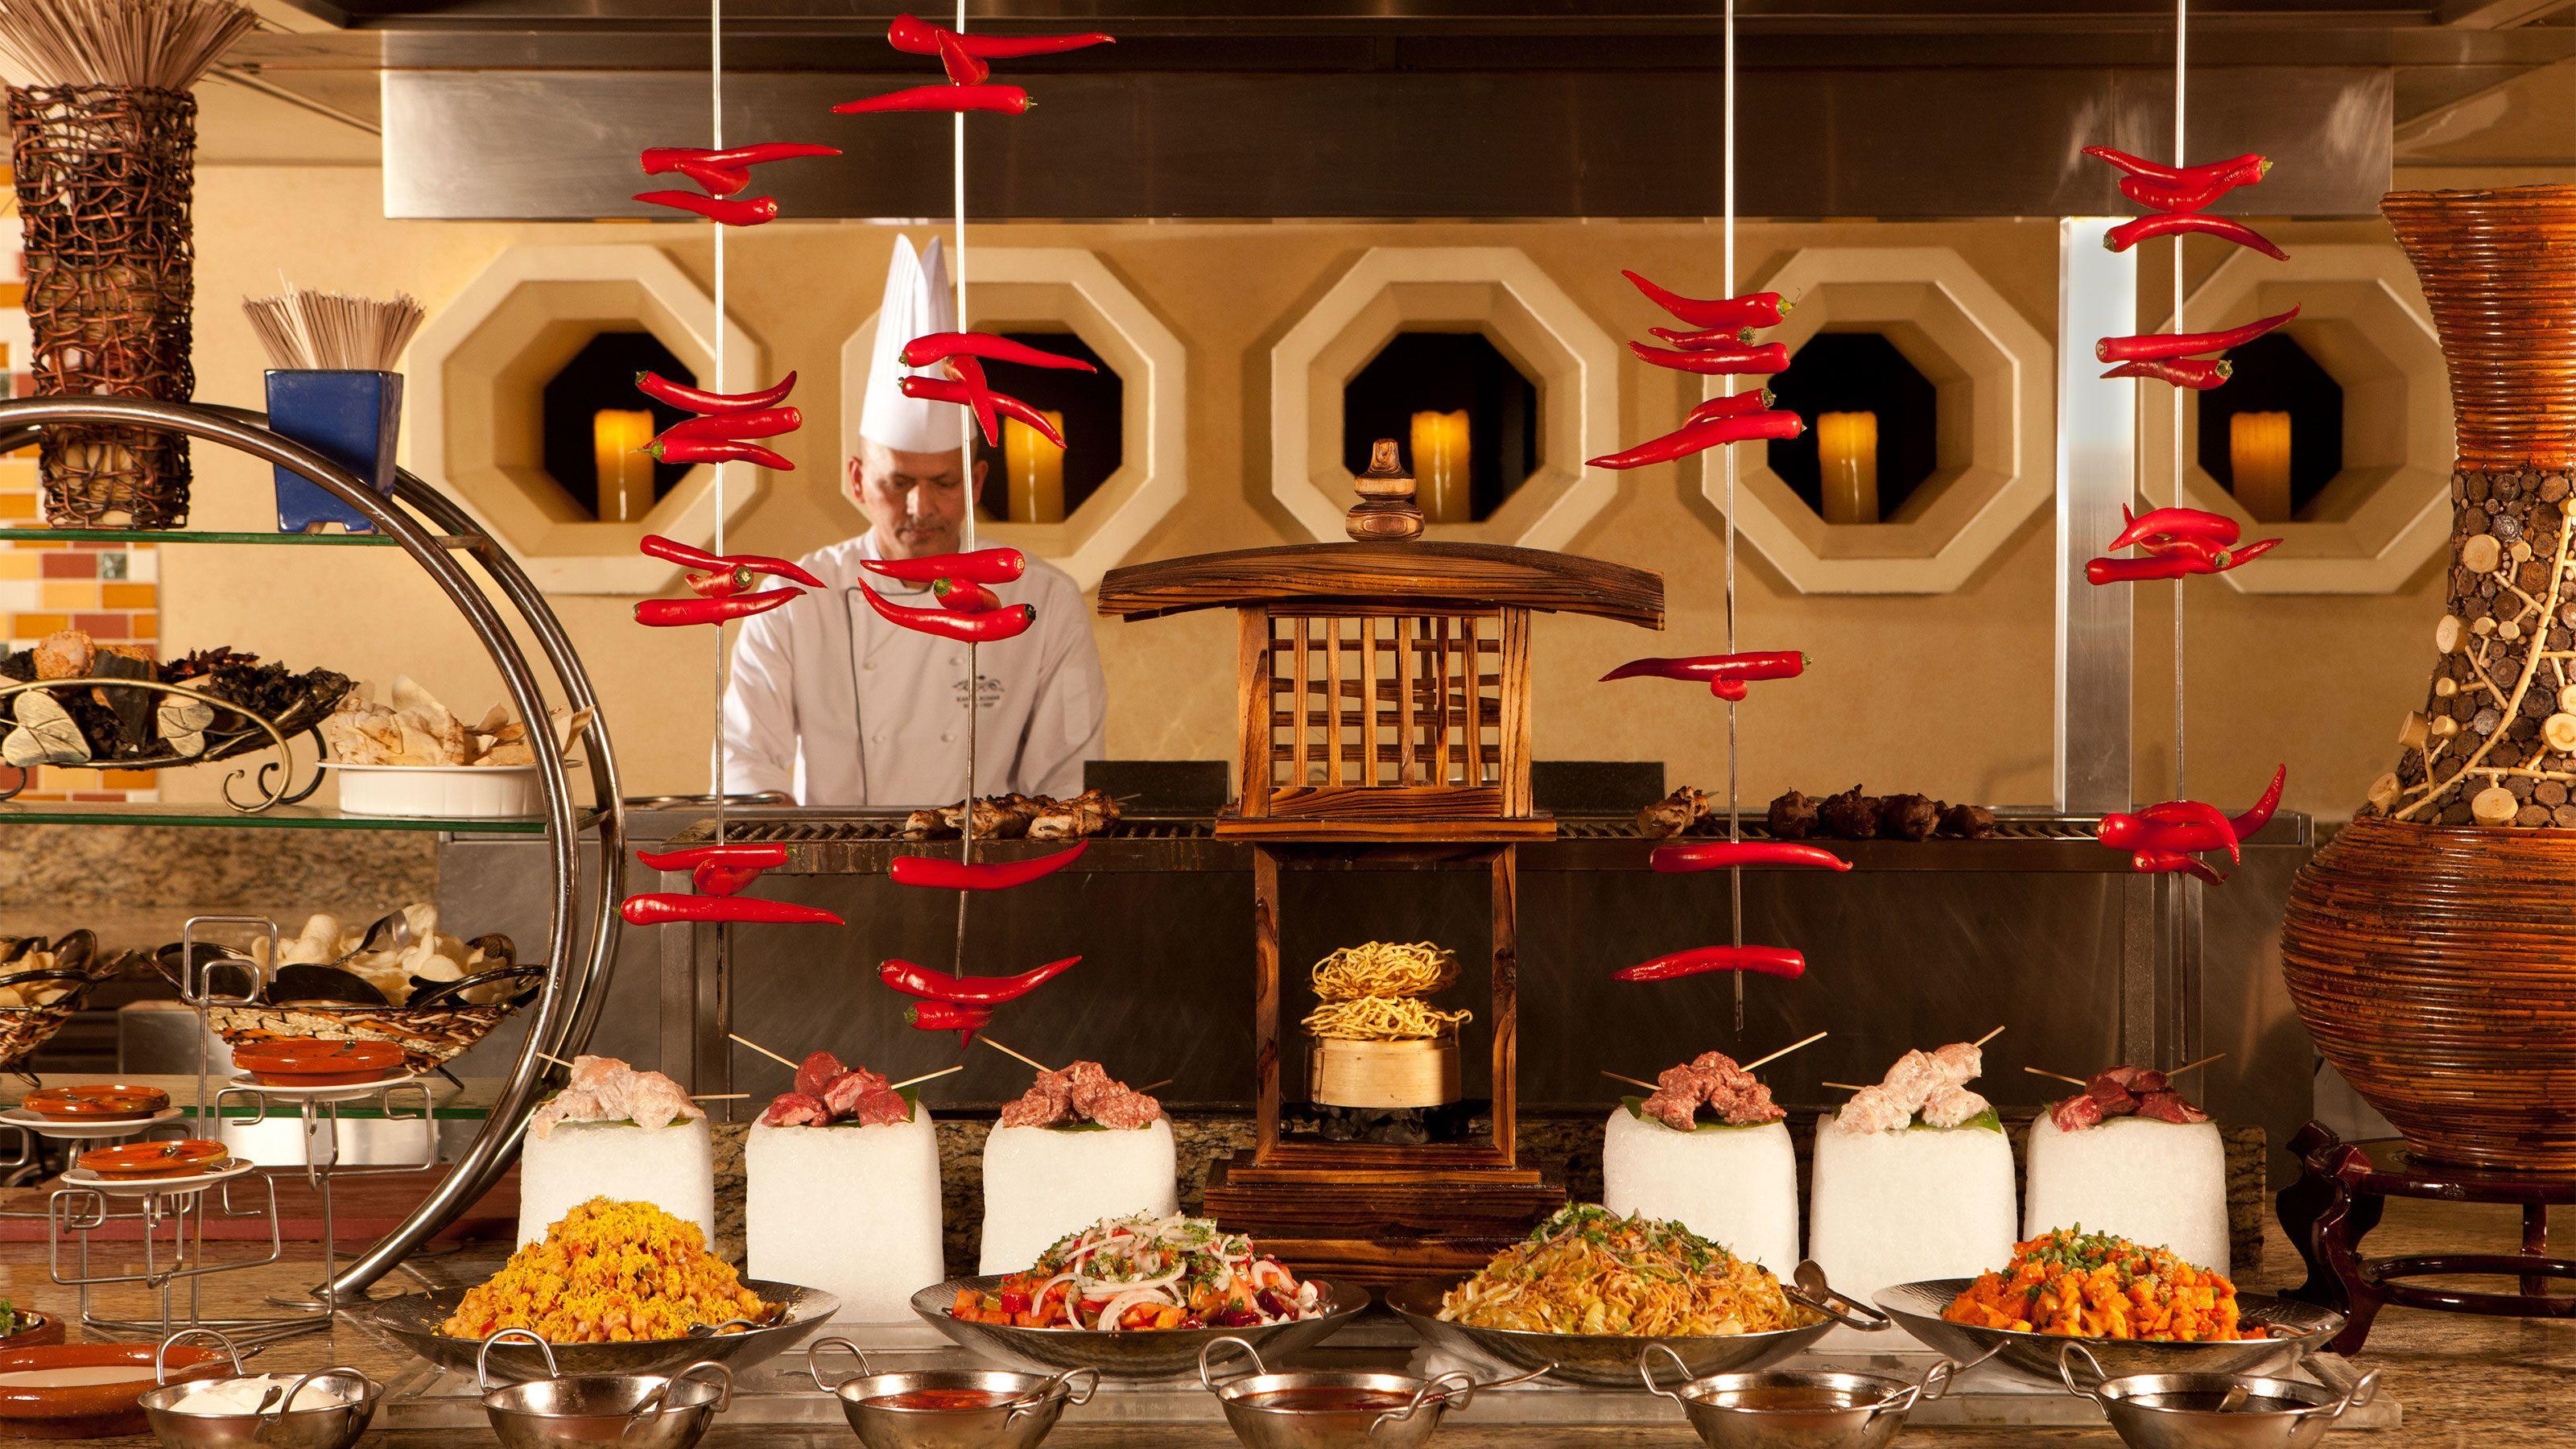 chef preparing food at Atlanyis buffet in Abu Dhabi